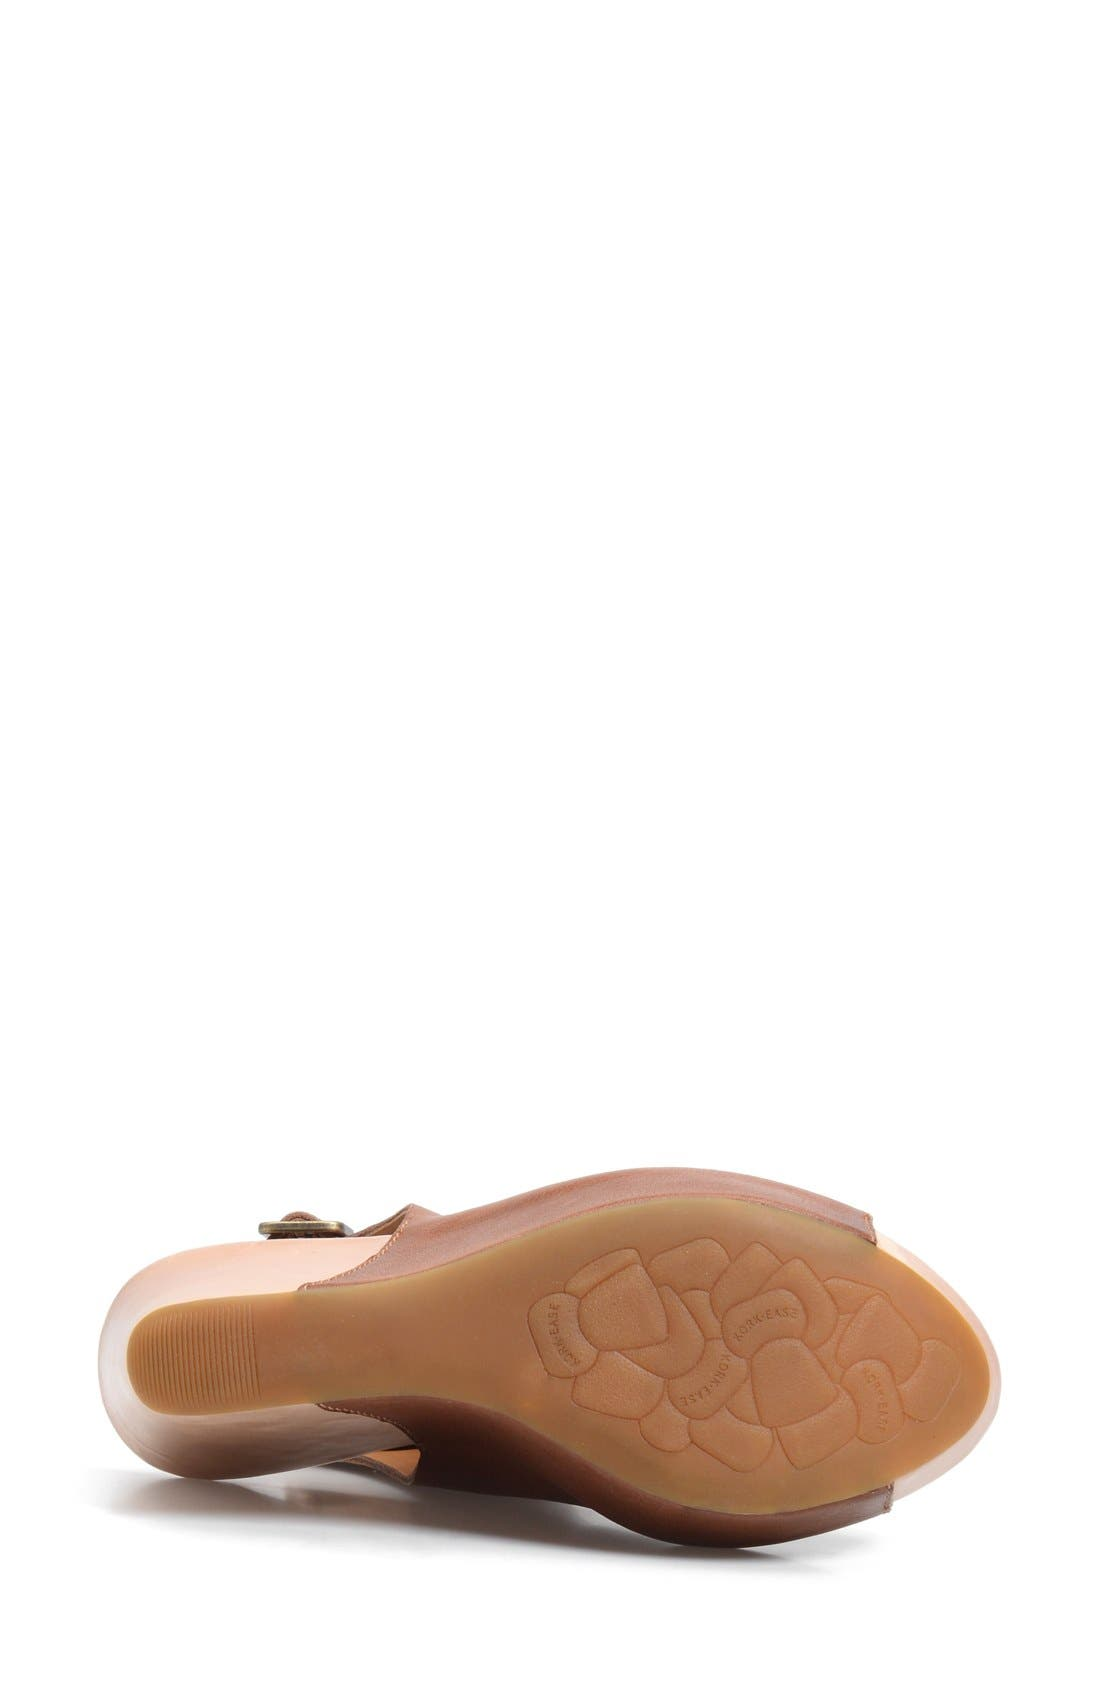 'Berit' Wedge Sandal,                             Alternate thumbnail 82, color,